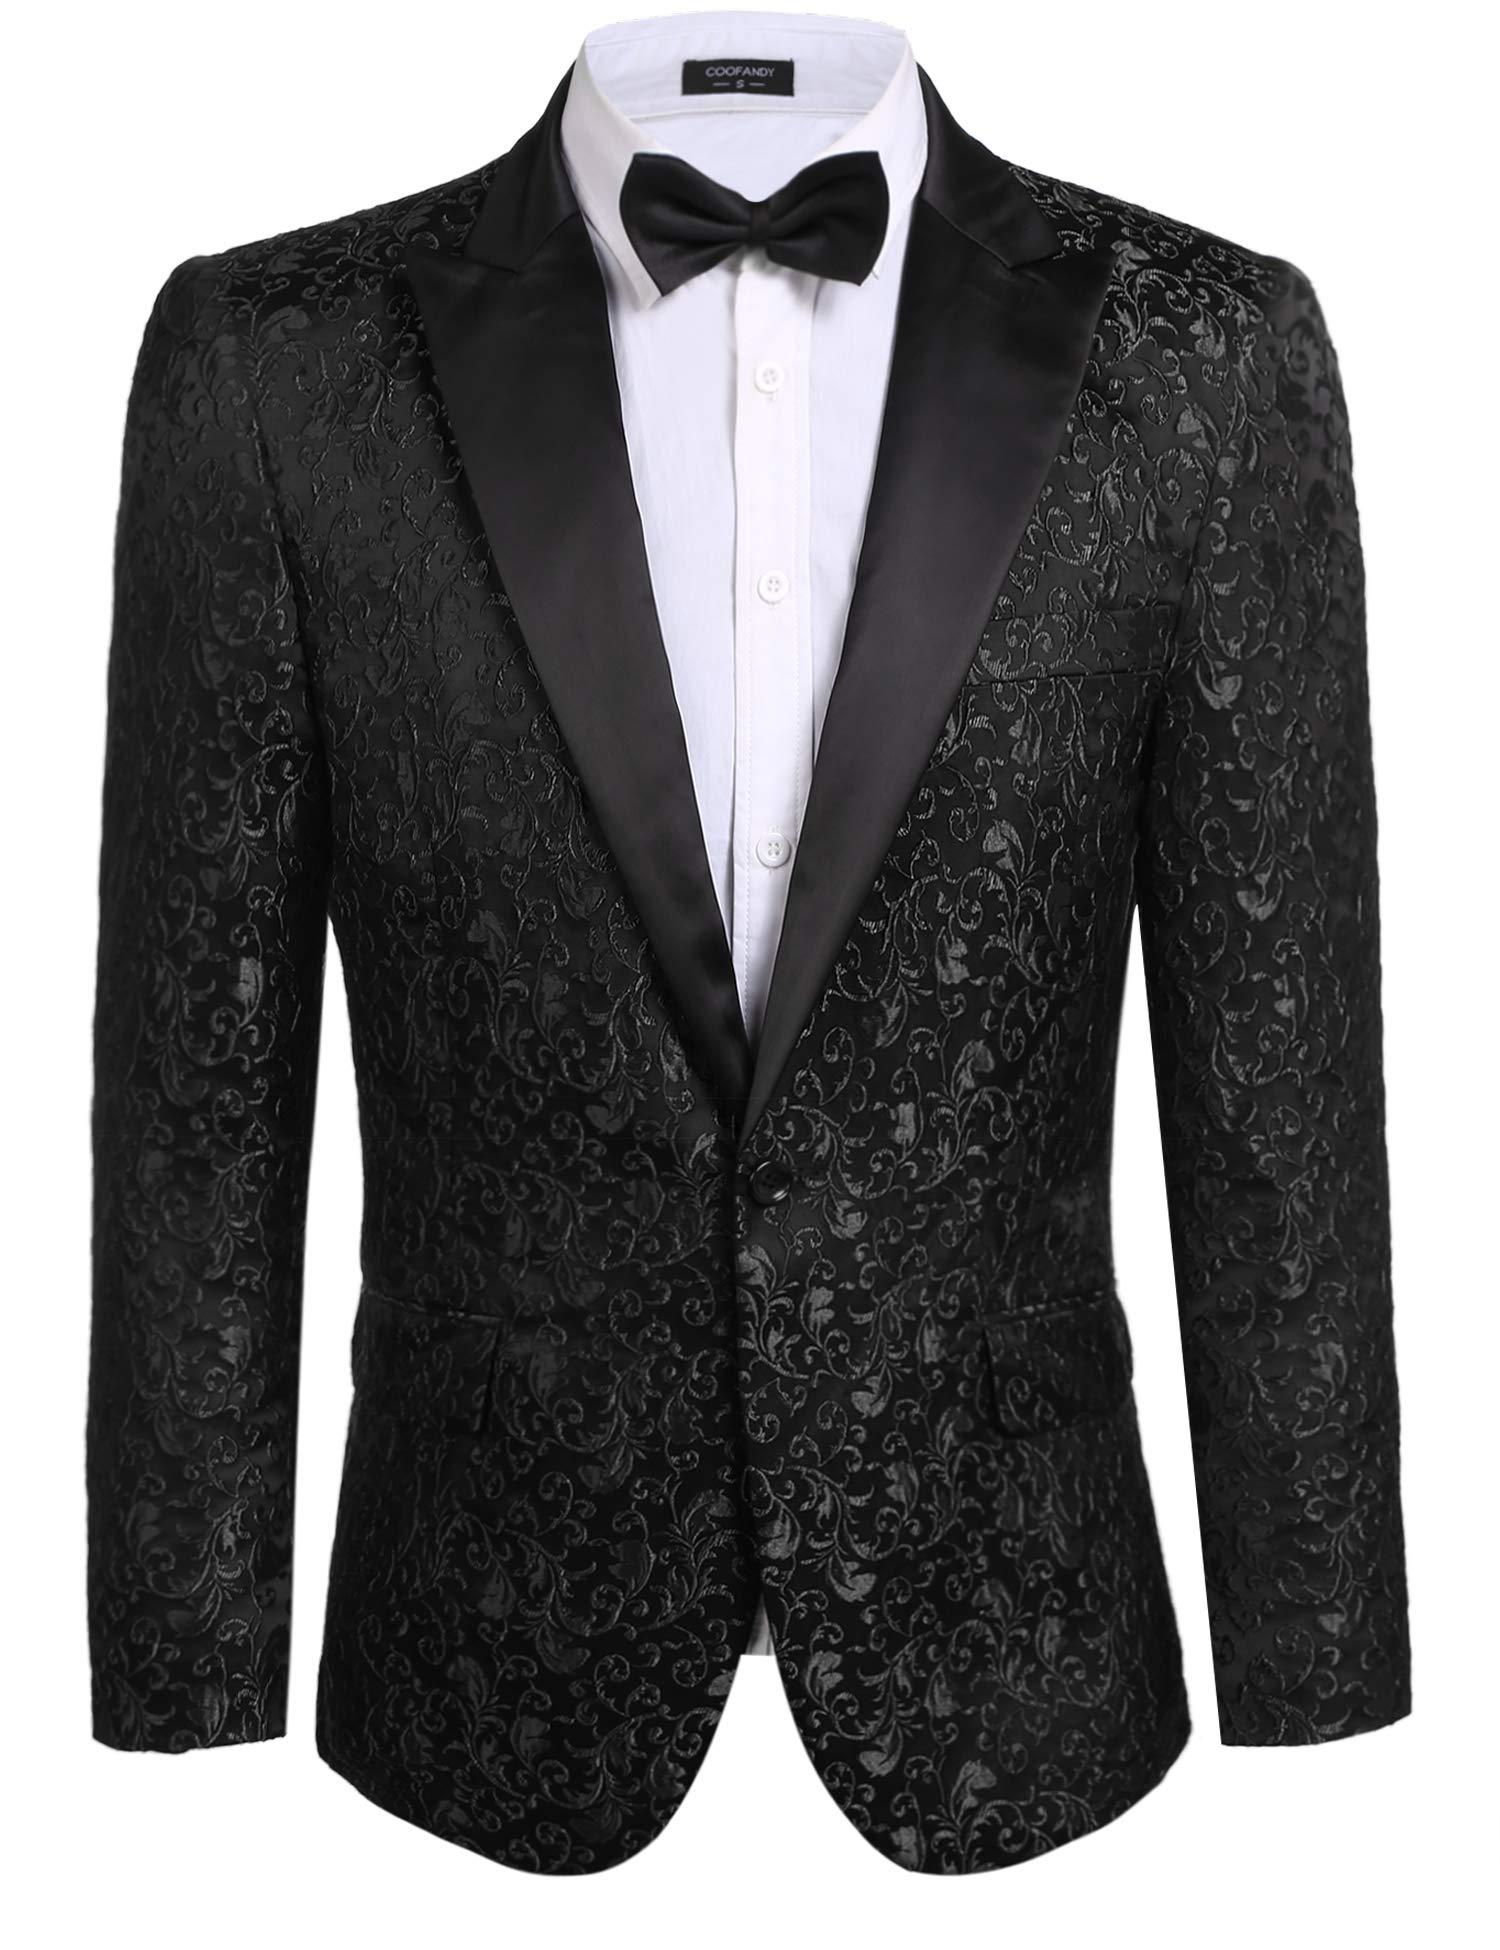 JINIDU Men's Floral Party Dress Suit Stylish Dinner Jacket Wedding Blazer Prom Tuxedo Black by JINIDU